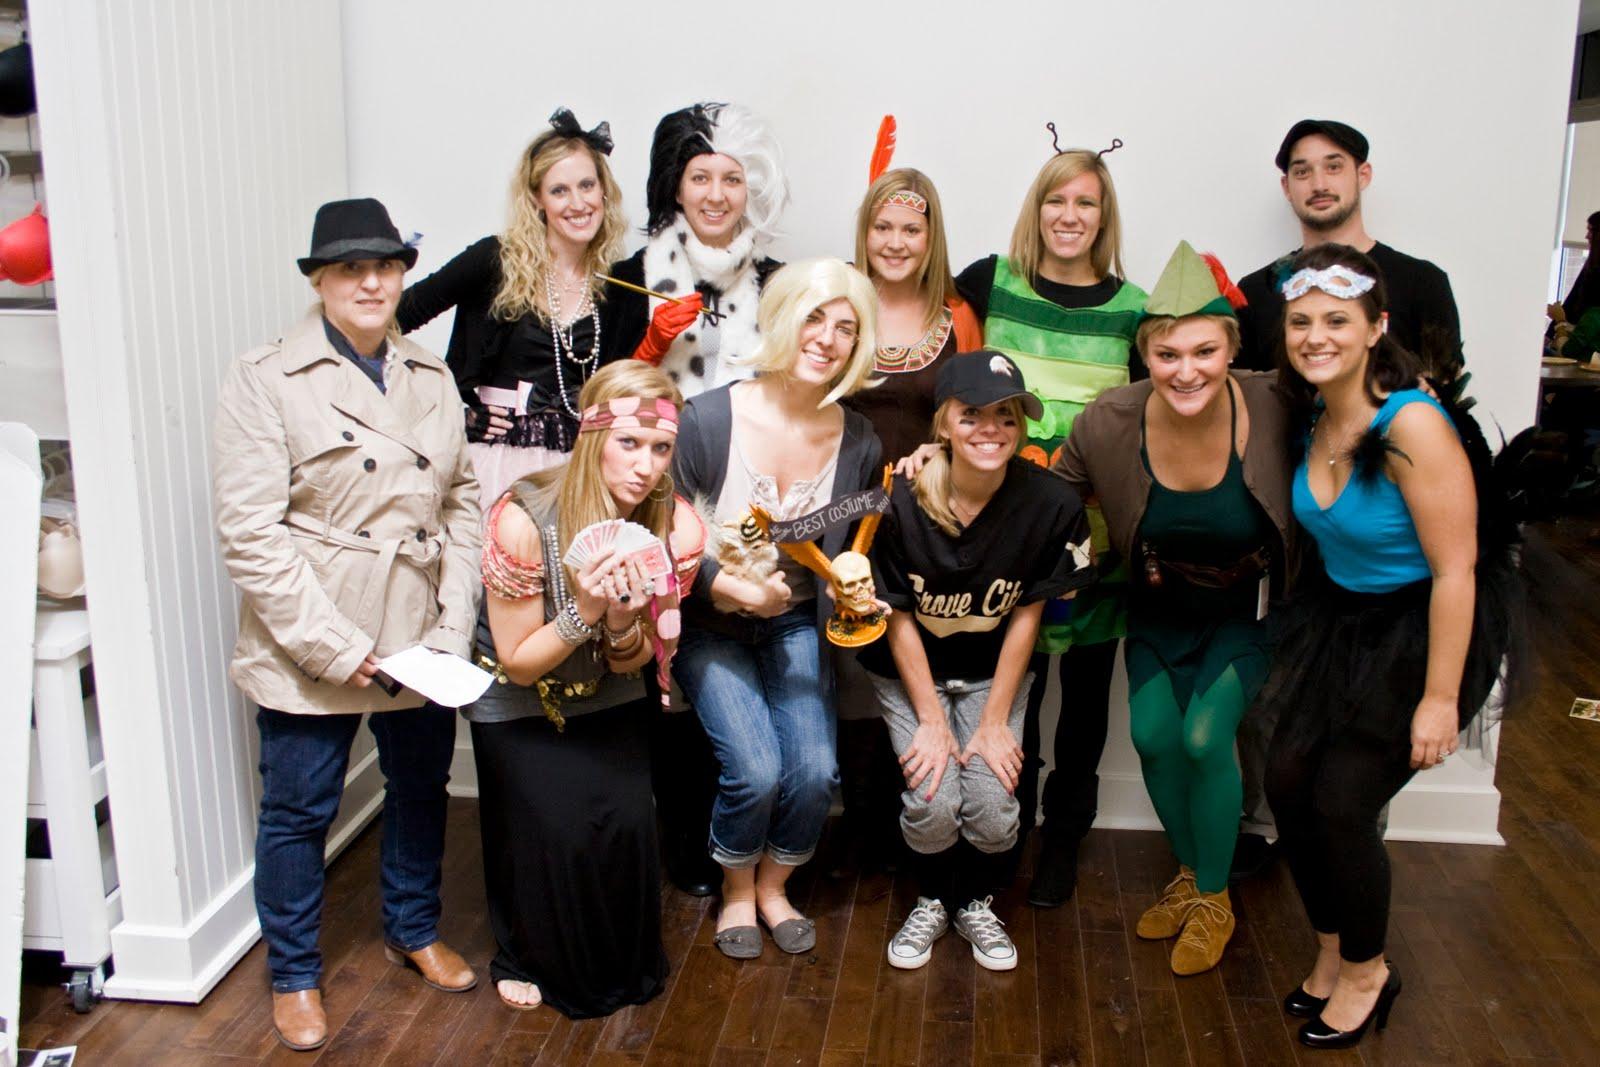 Office halloween costumes - Happy Halloween Office Edition